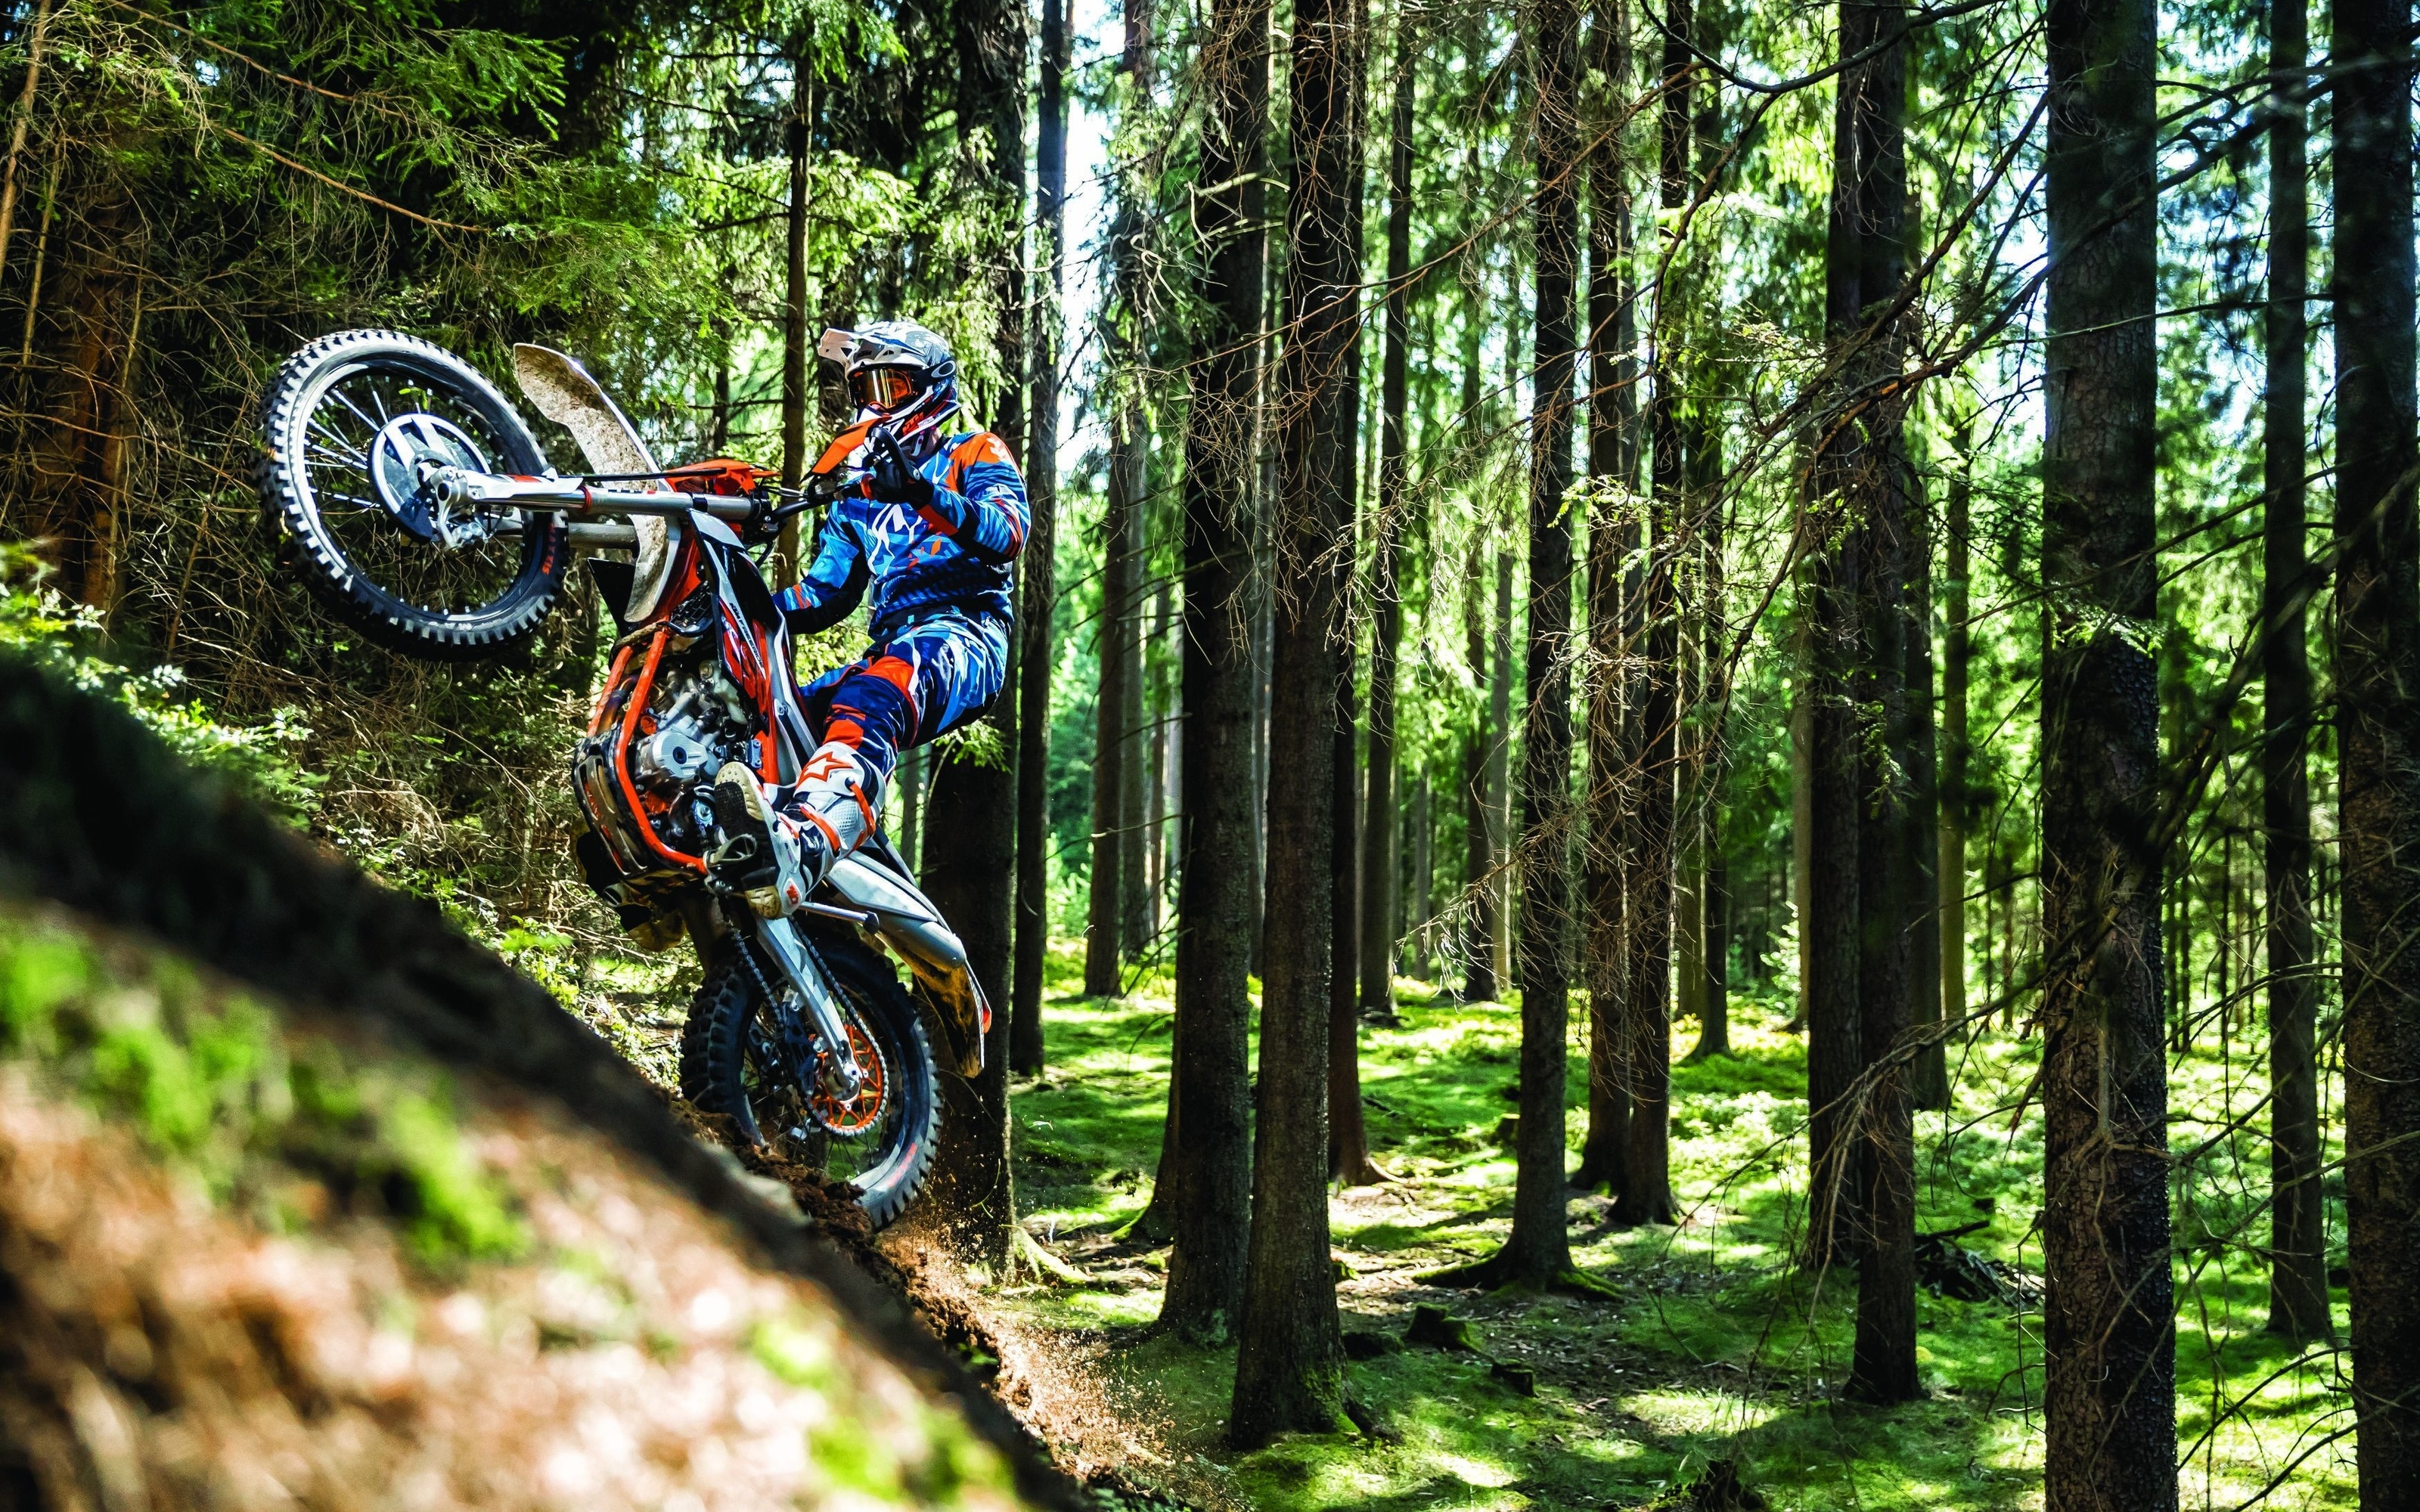 People 3200x2000 forest trees vehicle motocross racing enduro fullface Wheelie Oakley motorcycle